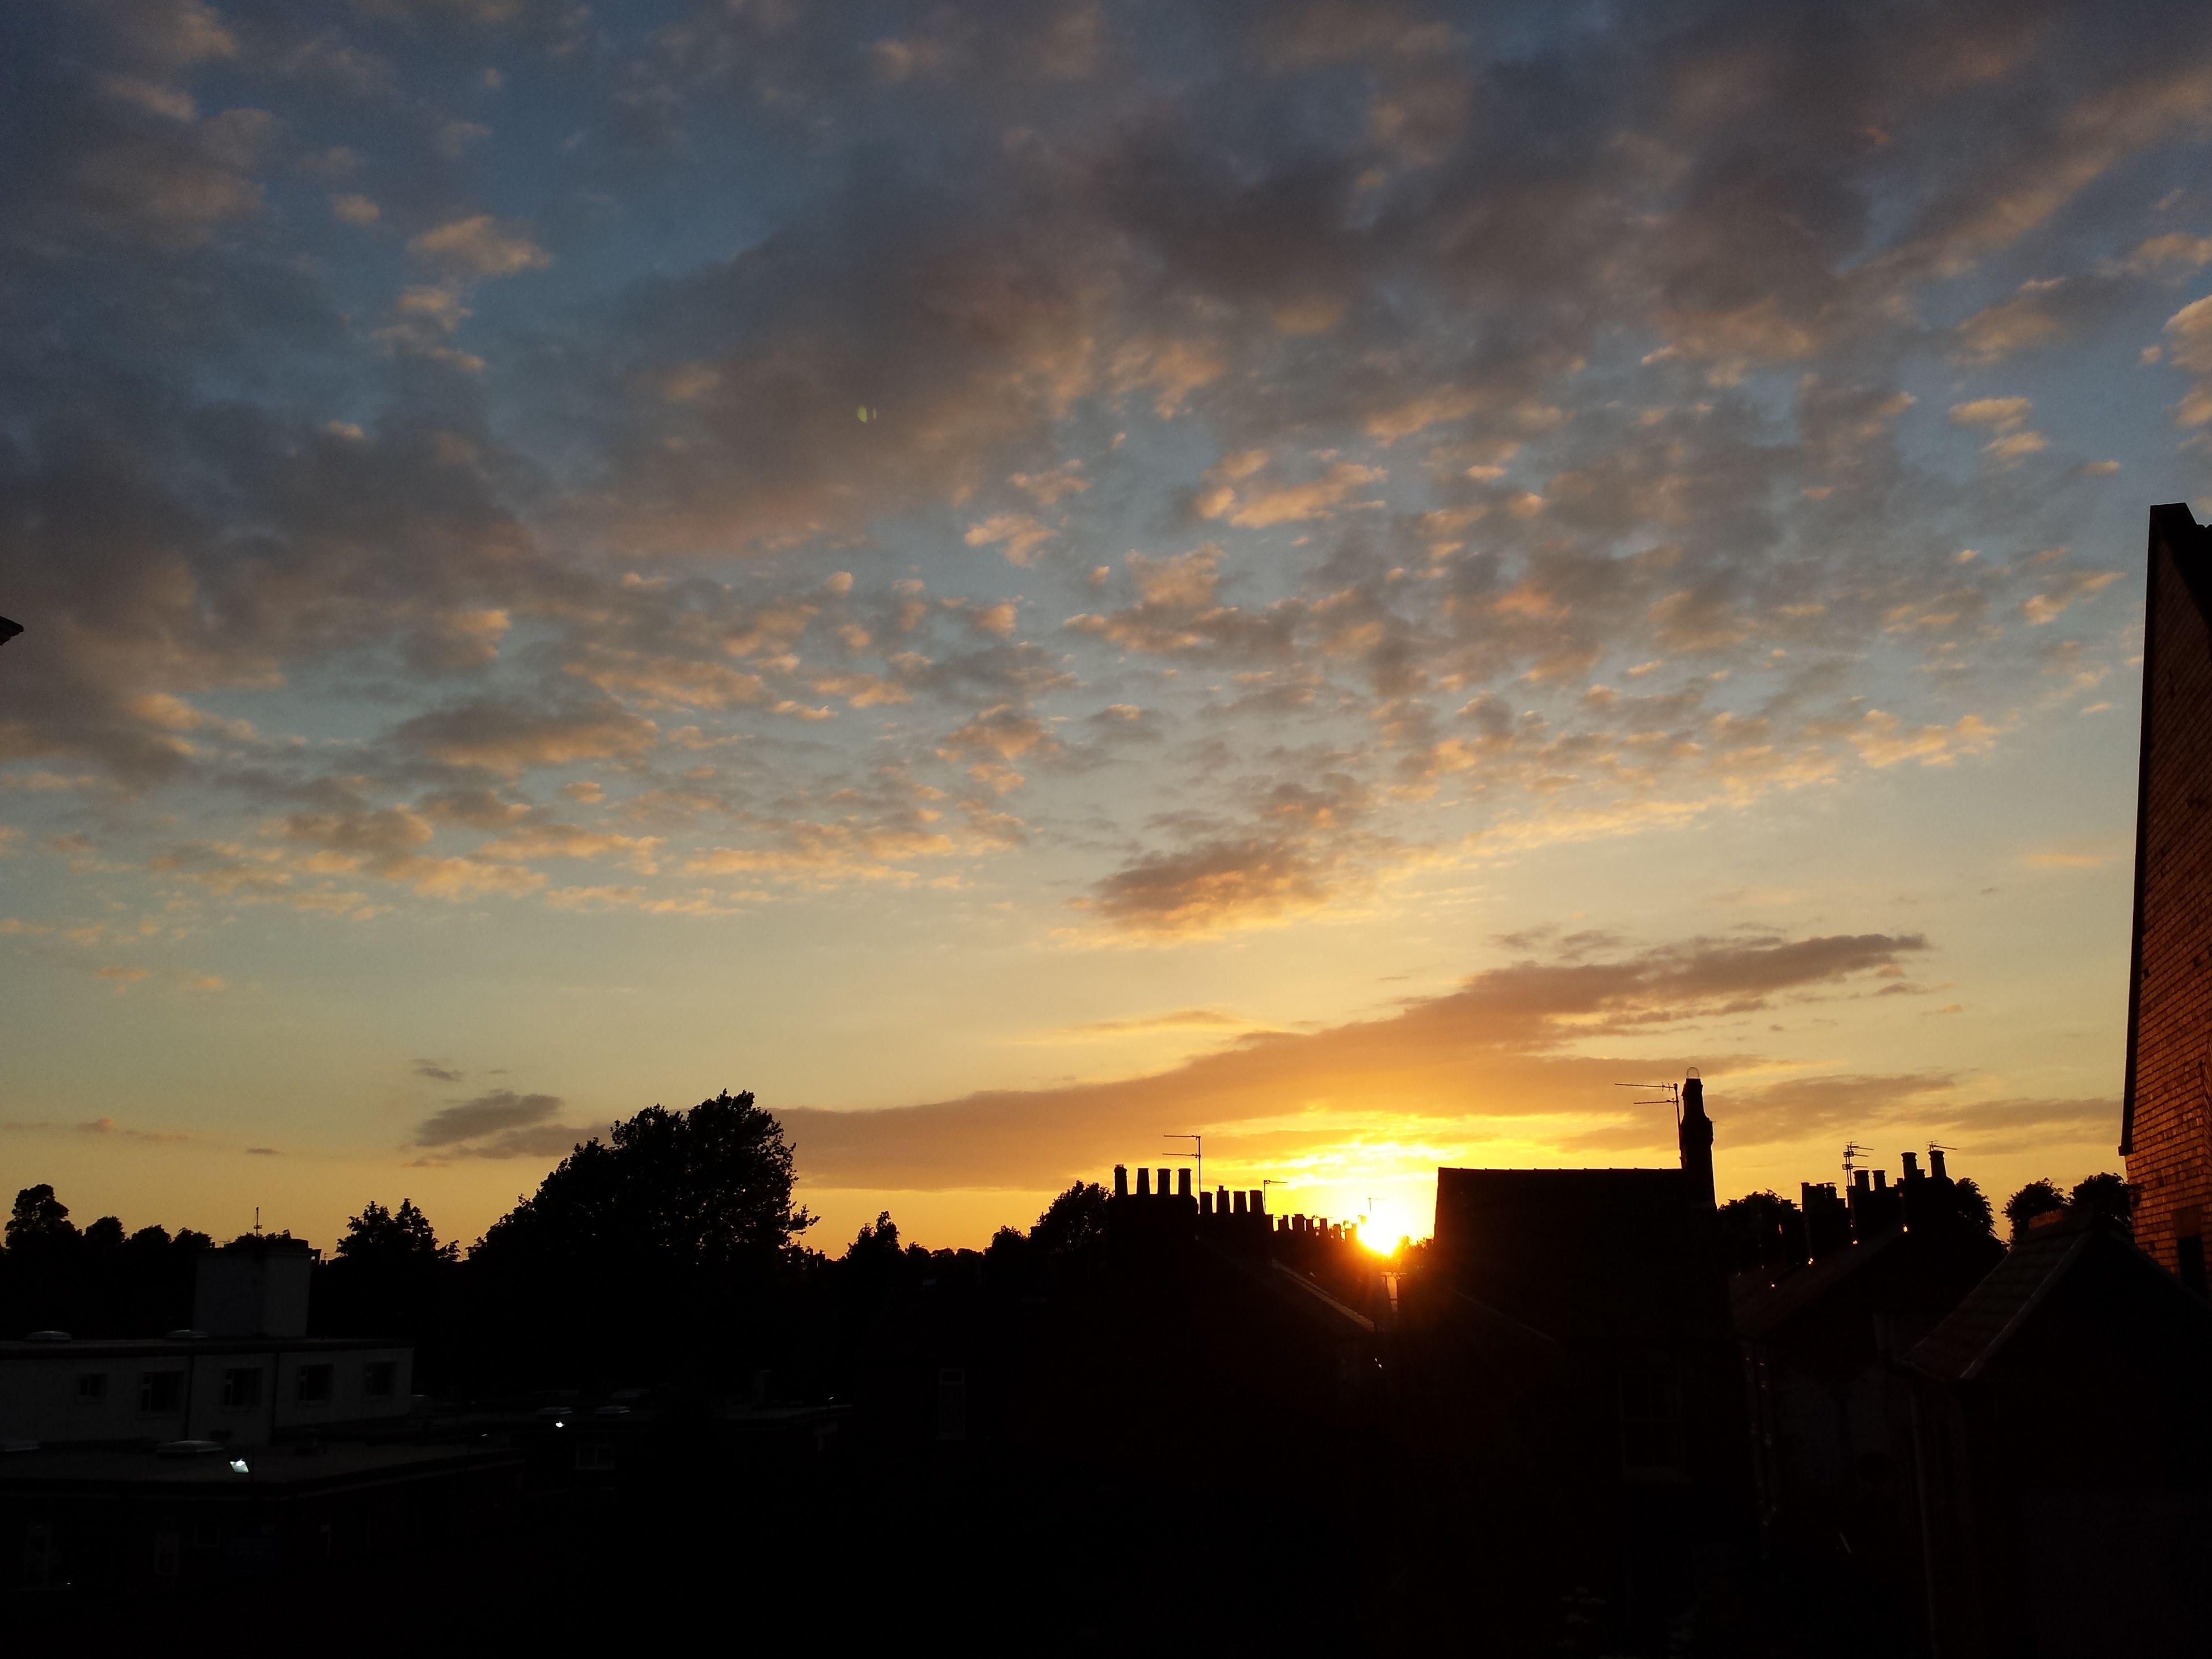 sunset, silhouette, sky, orange color, building exterior, cloud - sky, built structure, architecture, beauty in nature, scenics, sun, nature, cloud, house, tranquil scene, tree, tranquility, dramatic sky, idyllic, sunlight